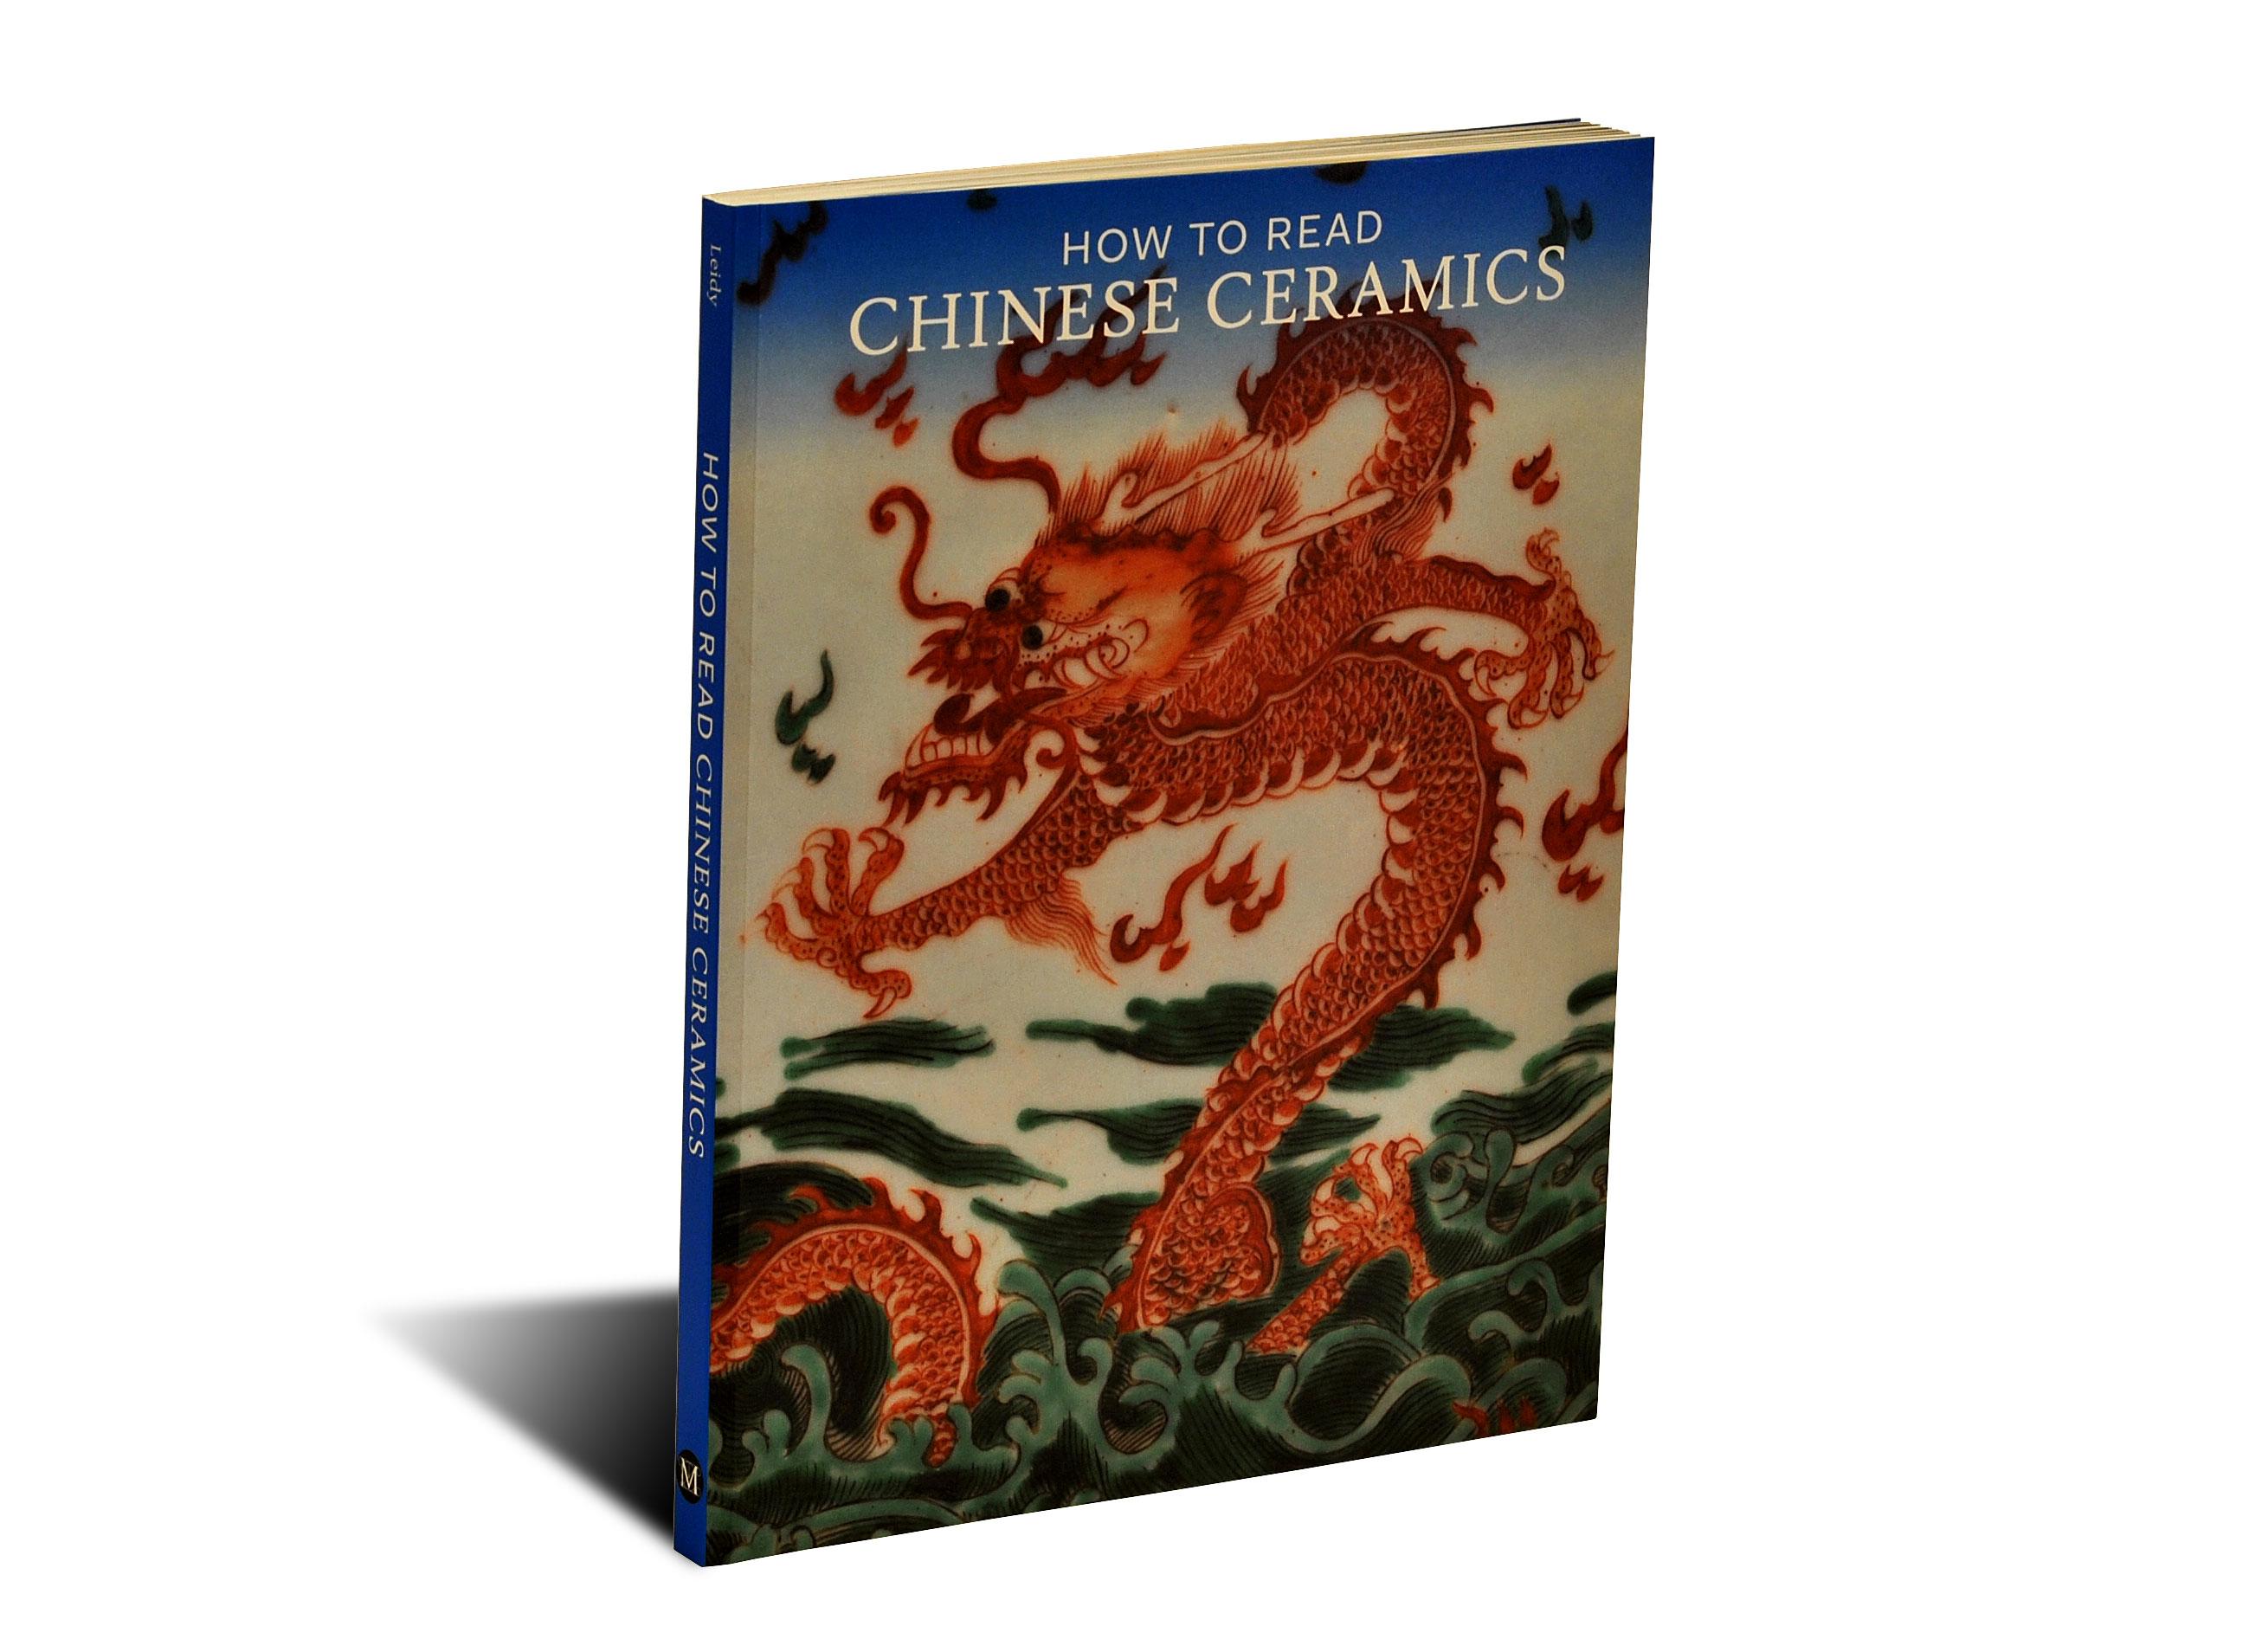 Portada del libro How to Read Chinese Ceramics